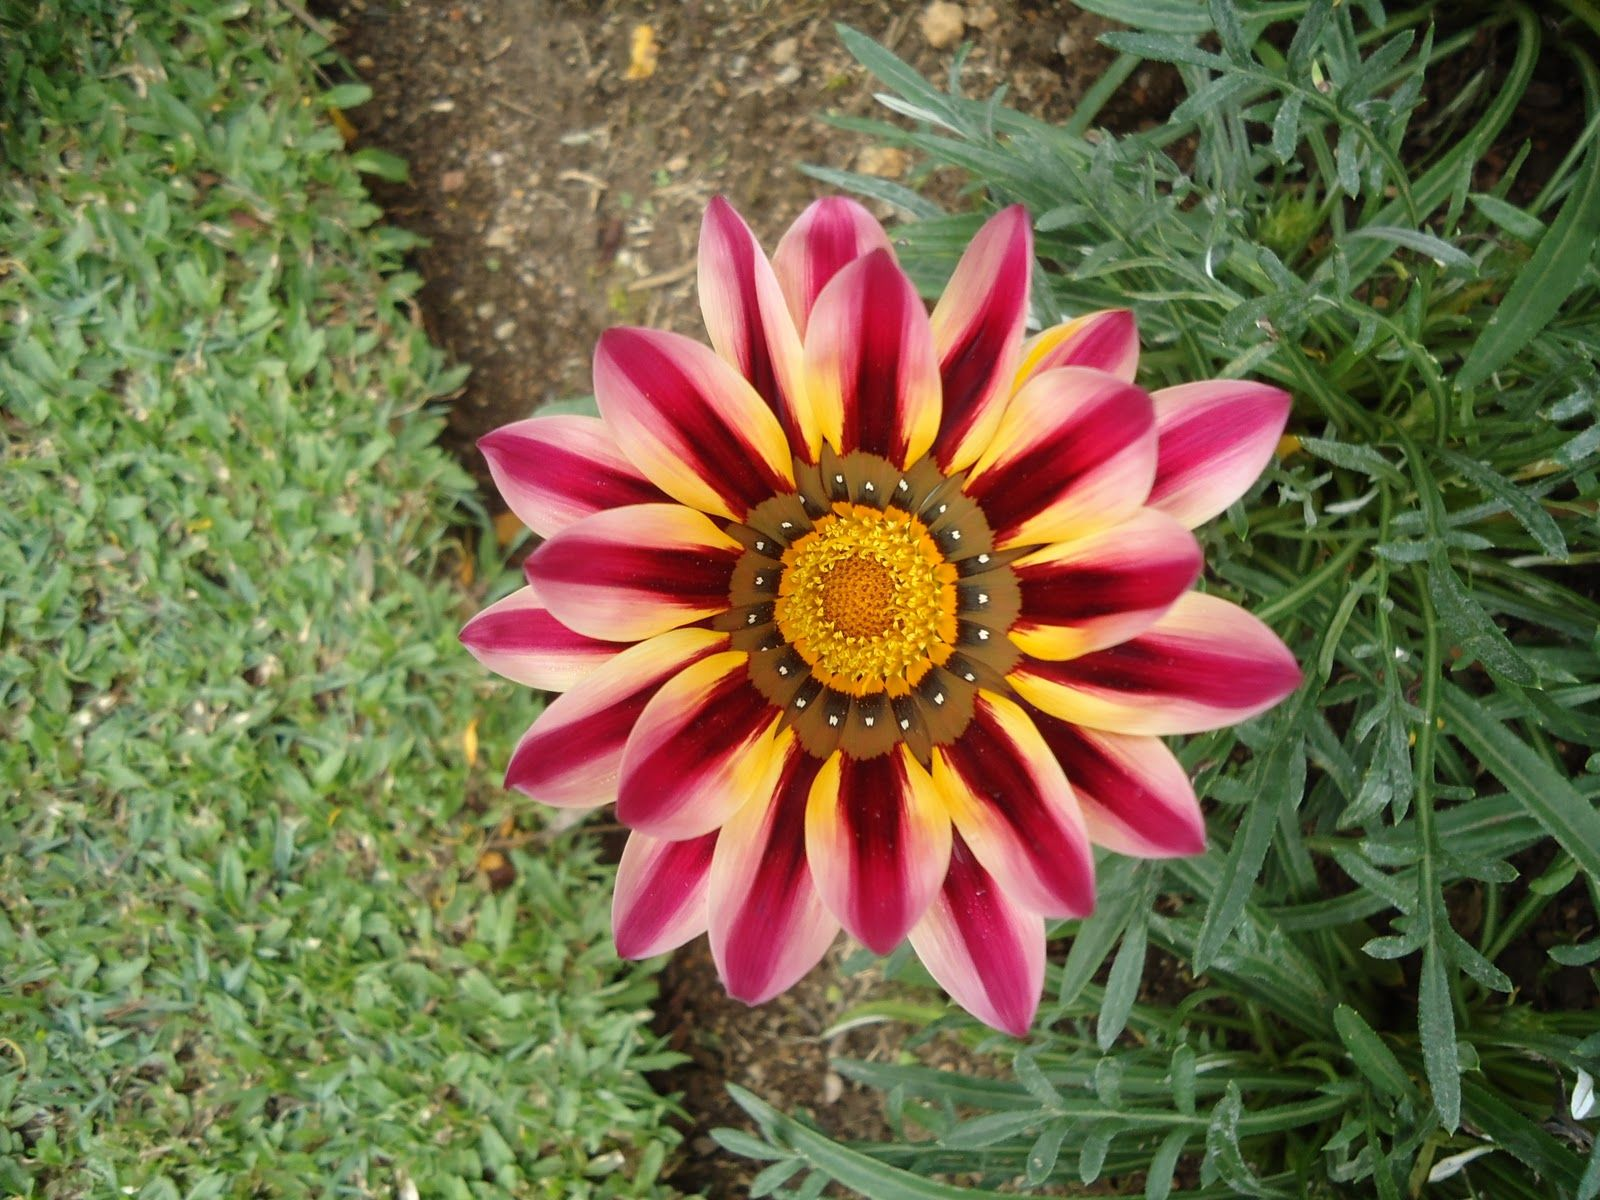 Nuwara Eliya Sri Lanka Flowers In Nuwara Eliya Nuwara Eliya Shade Garden Flowers